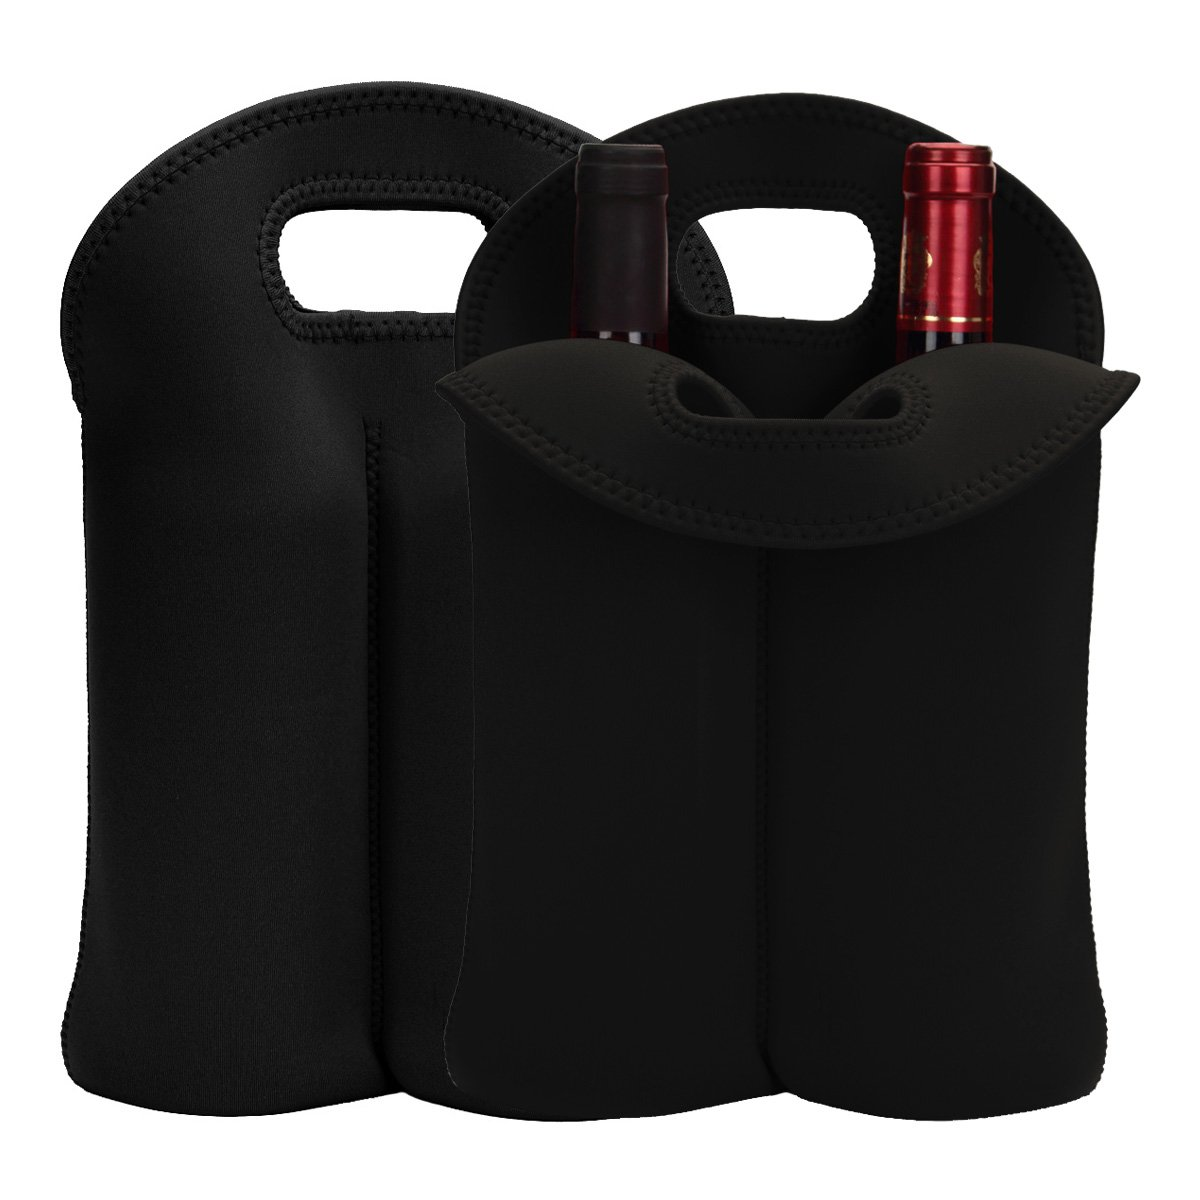 Amazon.com: laishalaiku botella fundas, Negro: Cell Phones ...